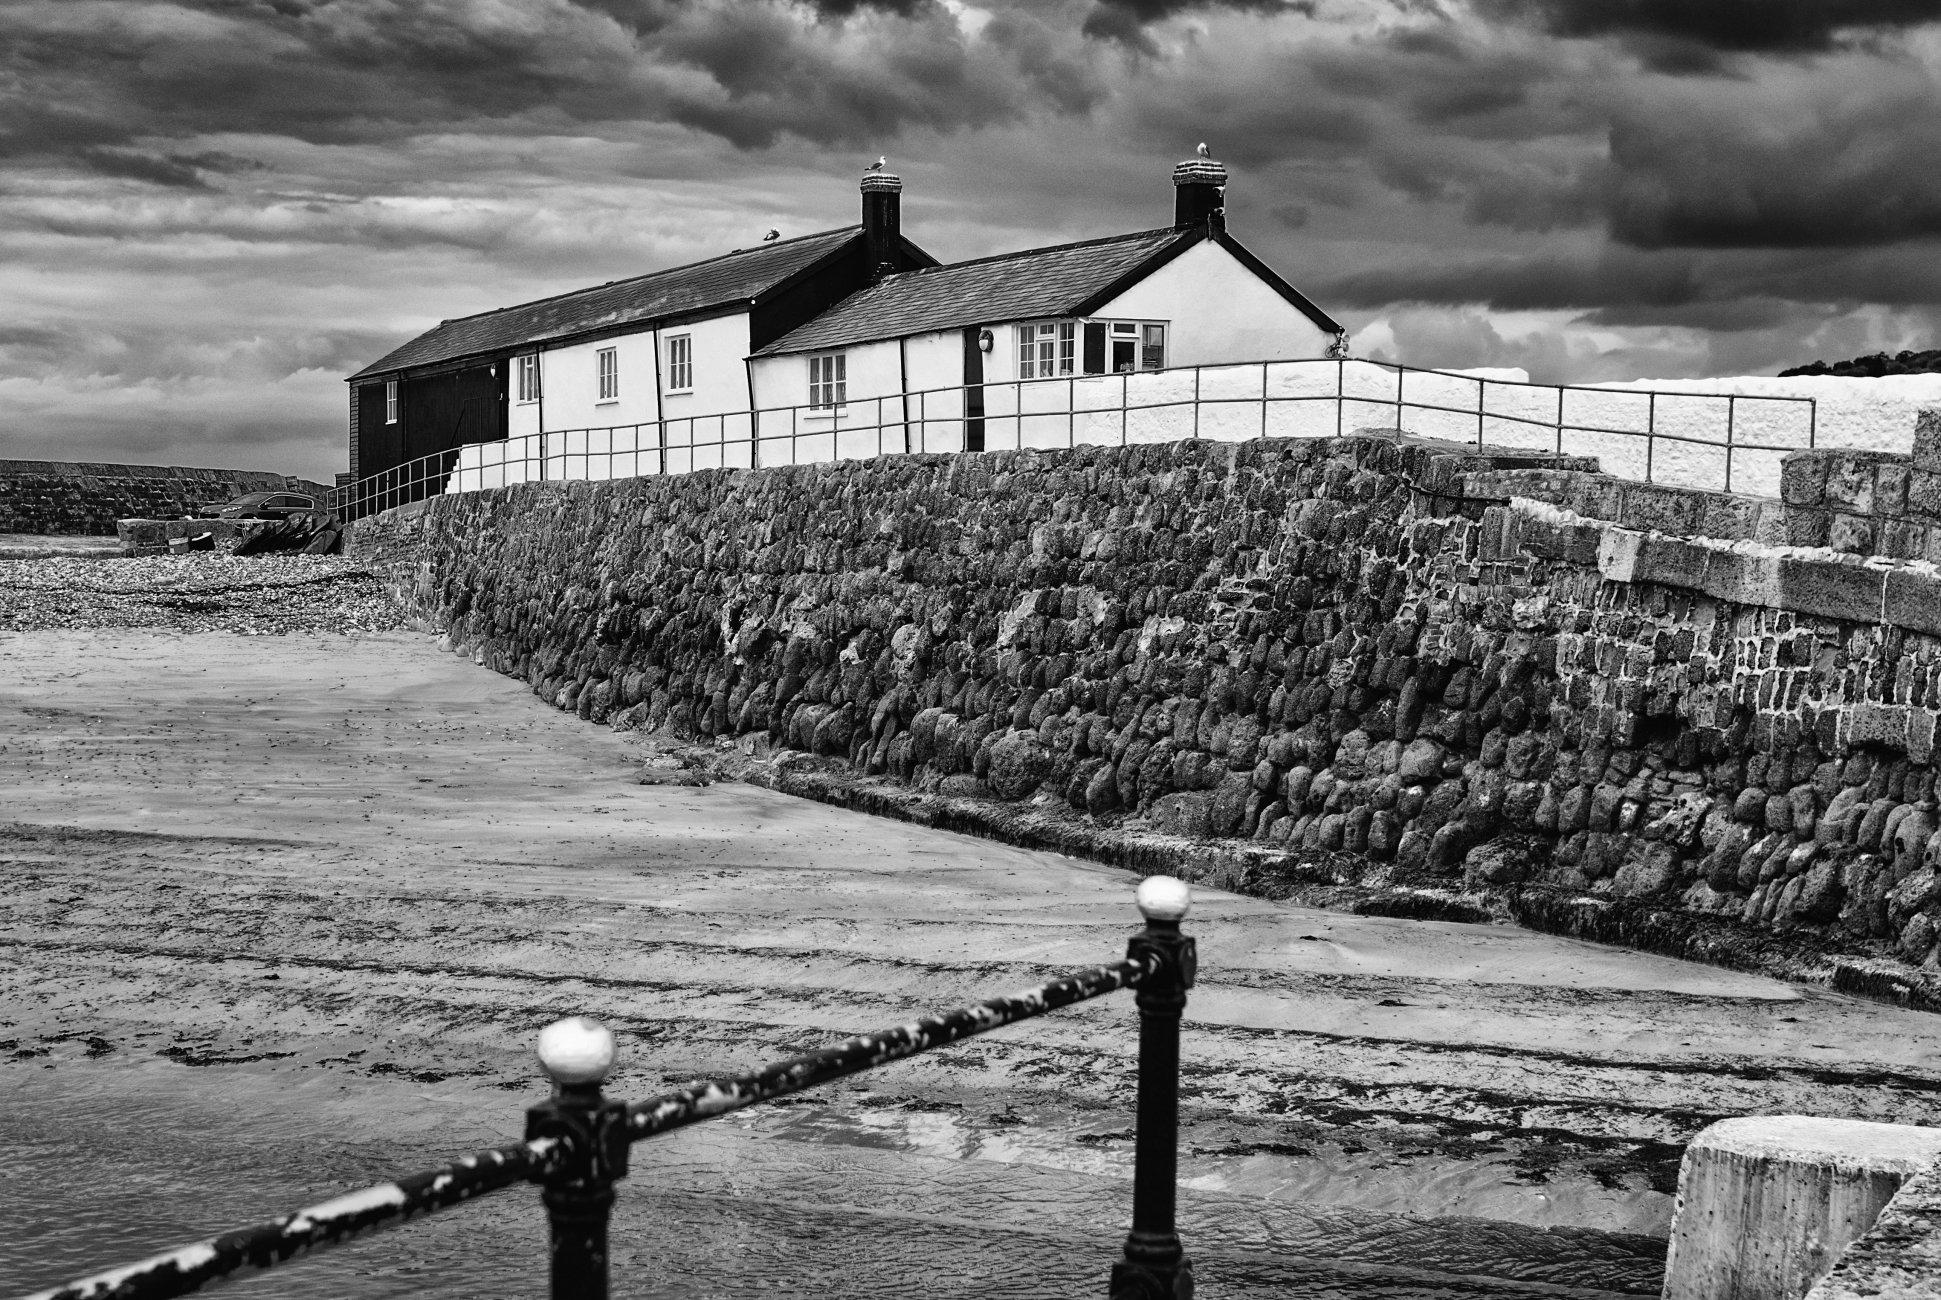 Lyme Regis - Back of the Cobb Buildings